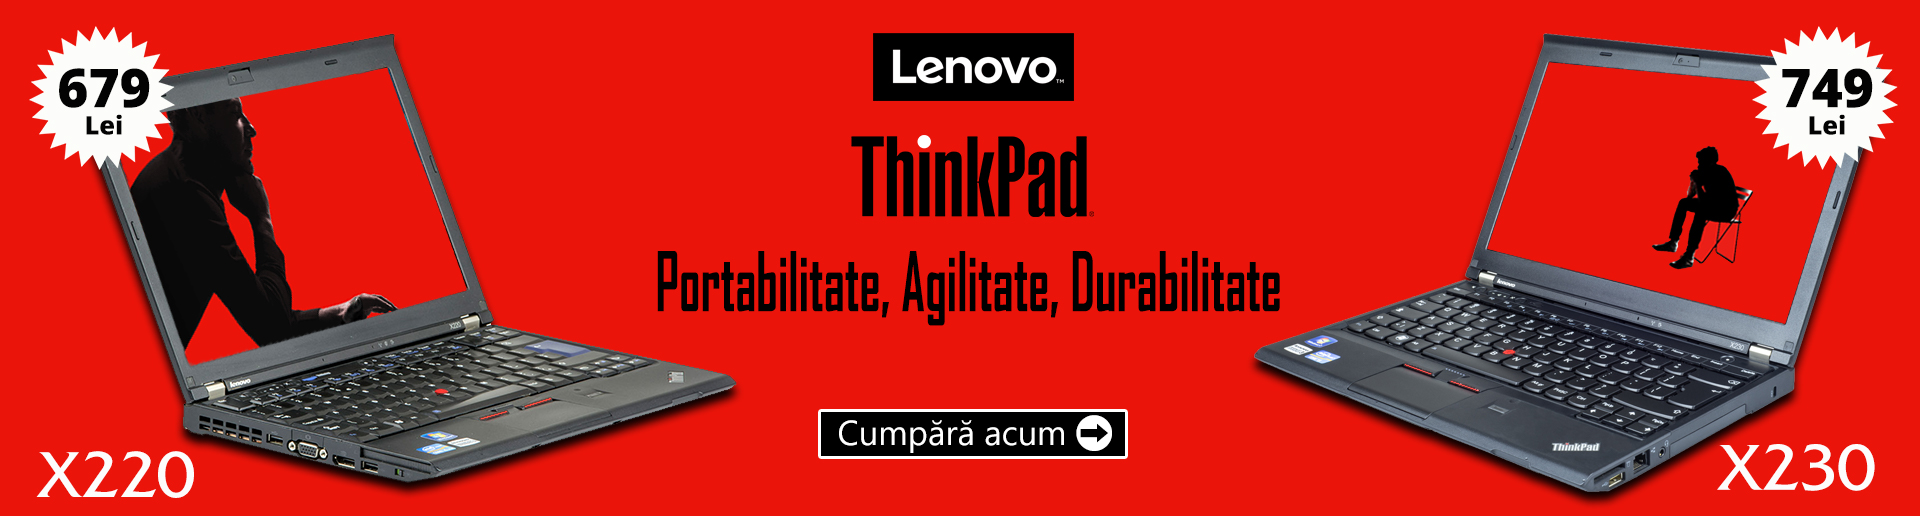 Lenovo X220-X230